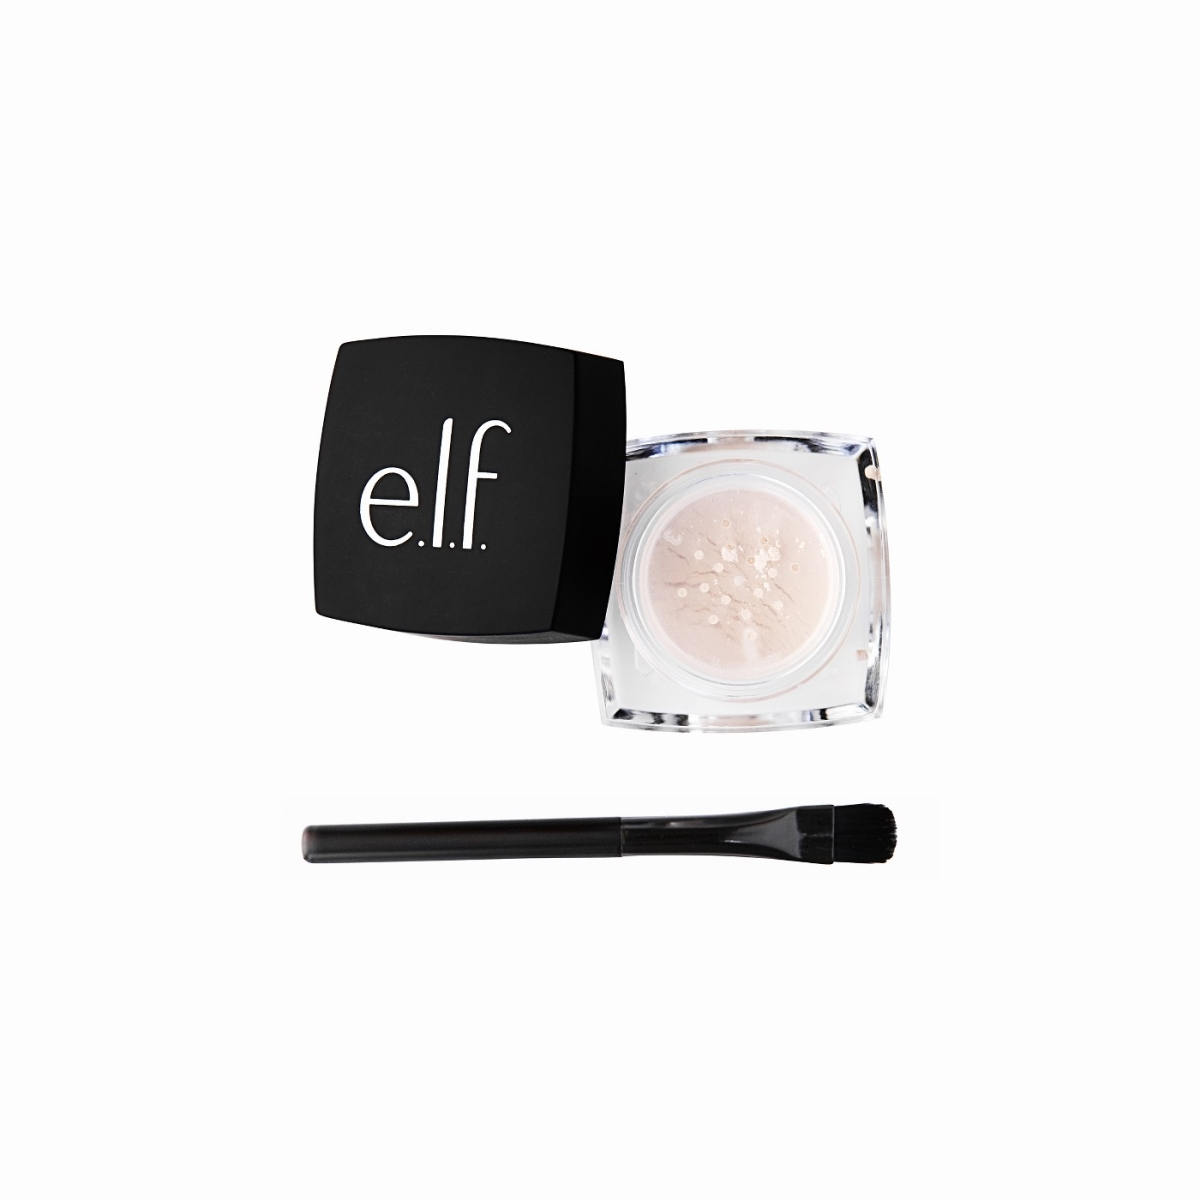 ELF Cosmetics 7993293 ELF Smooth & Set Eye Powder Brown 81511 - Pack of 4